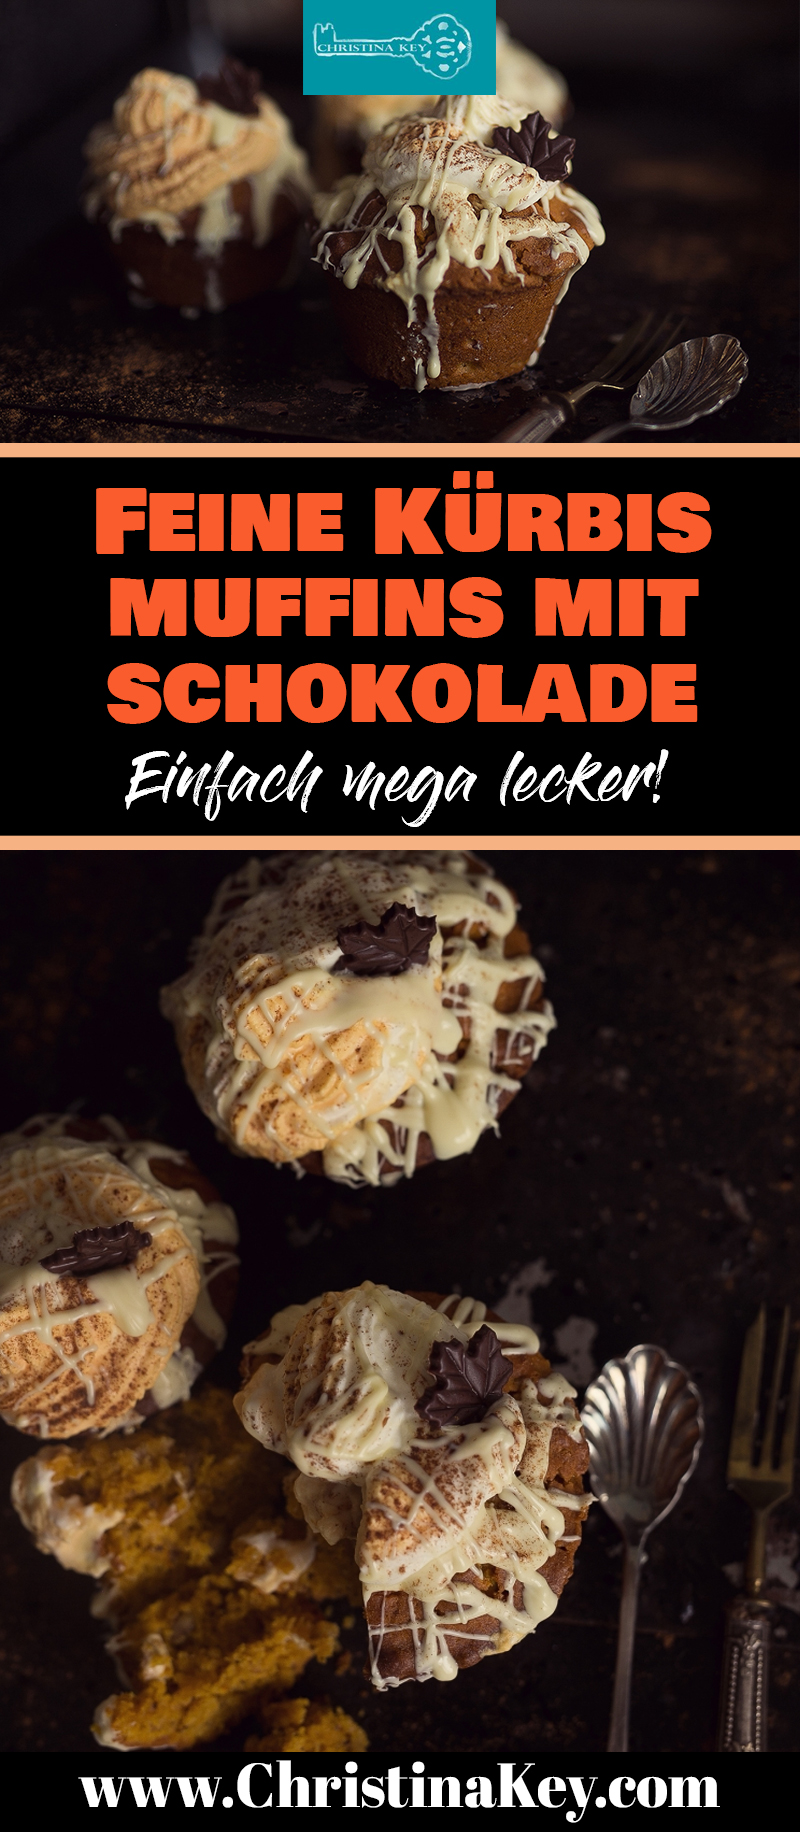 Kürbis Rezepte Muffins mit Schokolade